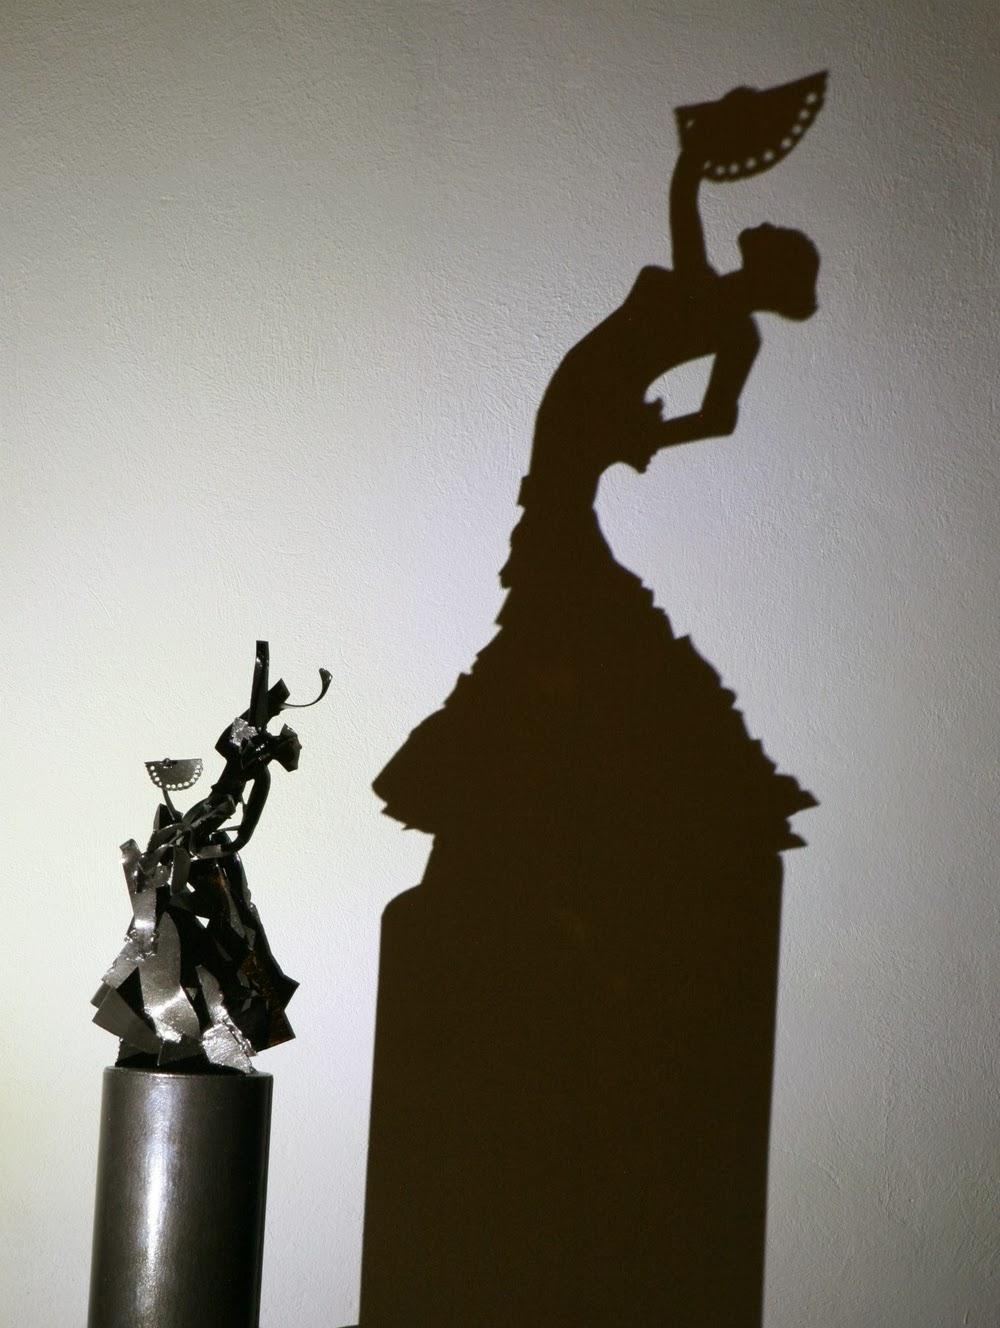 10-Flamenco-Dancer-Teodosio-Sectio-Aurea-Shadow-Art-www-designstack-co